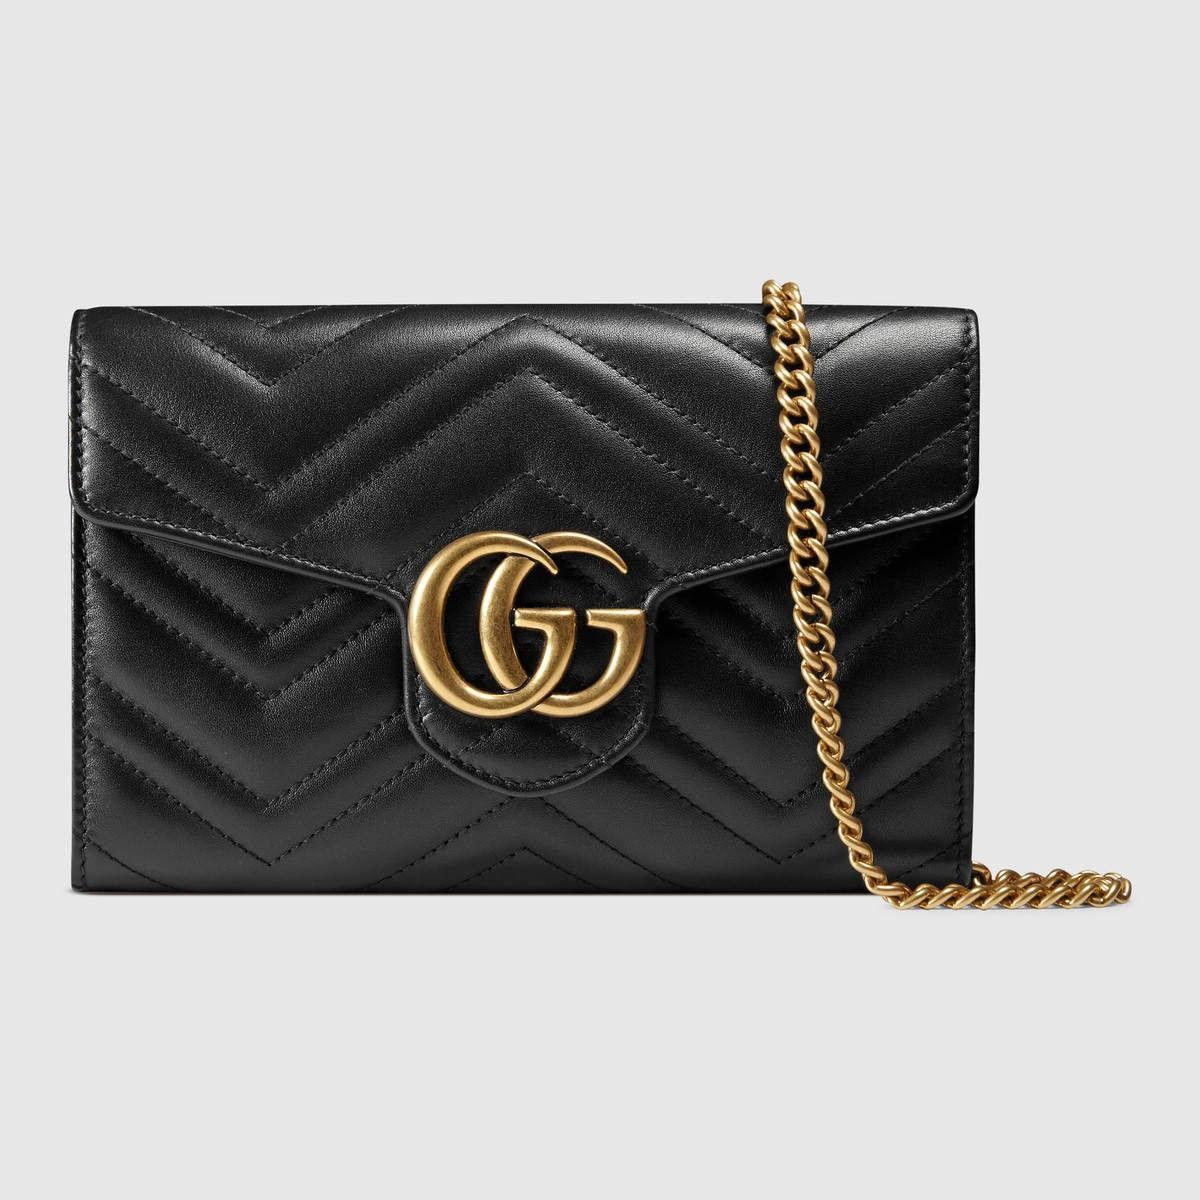 a305294fdd5 GUCCI Gg Marmont Matelassé Mini Bag - Black Leather.  gucci  bags  shoulder  bags  wallet  leather  accessories